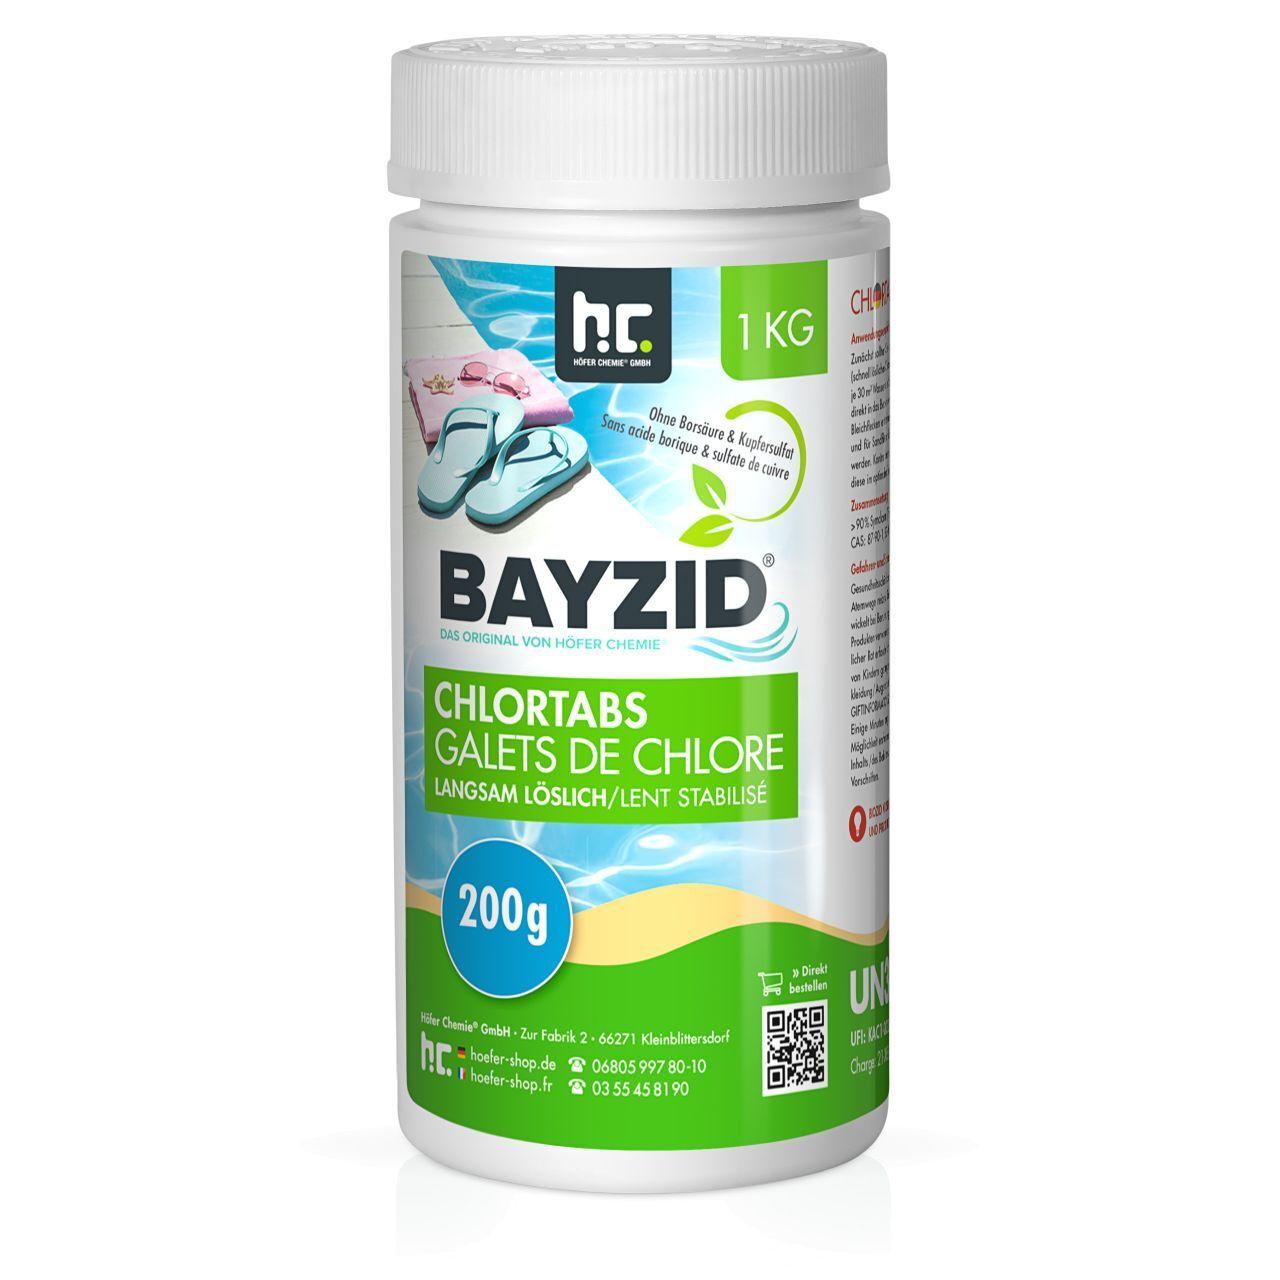 BAYZID 12 kg Bayzid® Galets de chlore lent (200g) (12 x 1 kg)